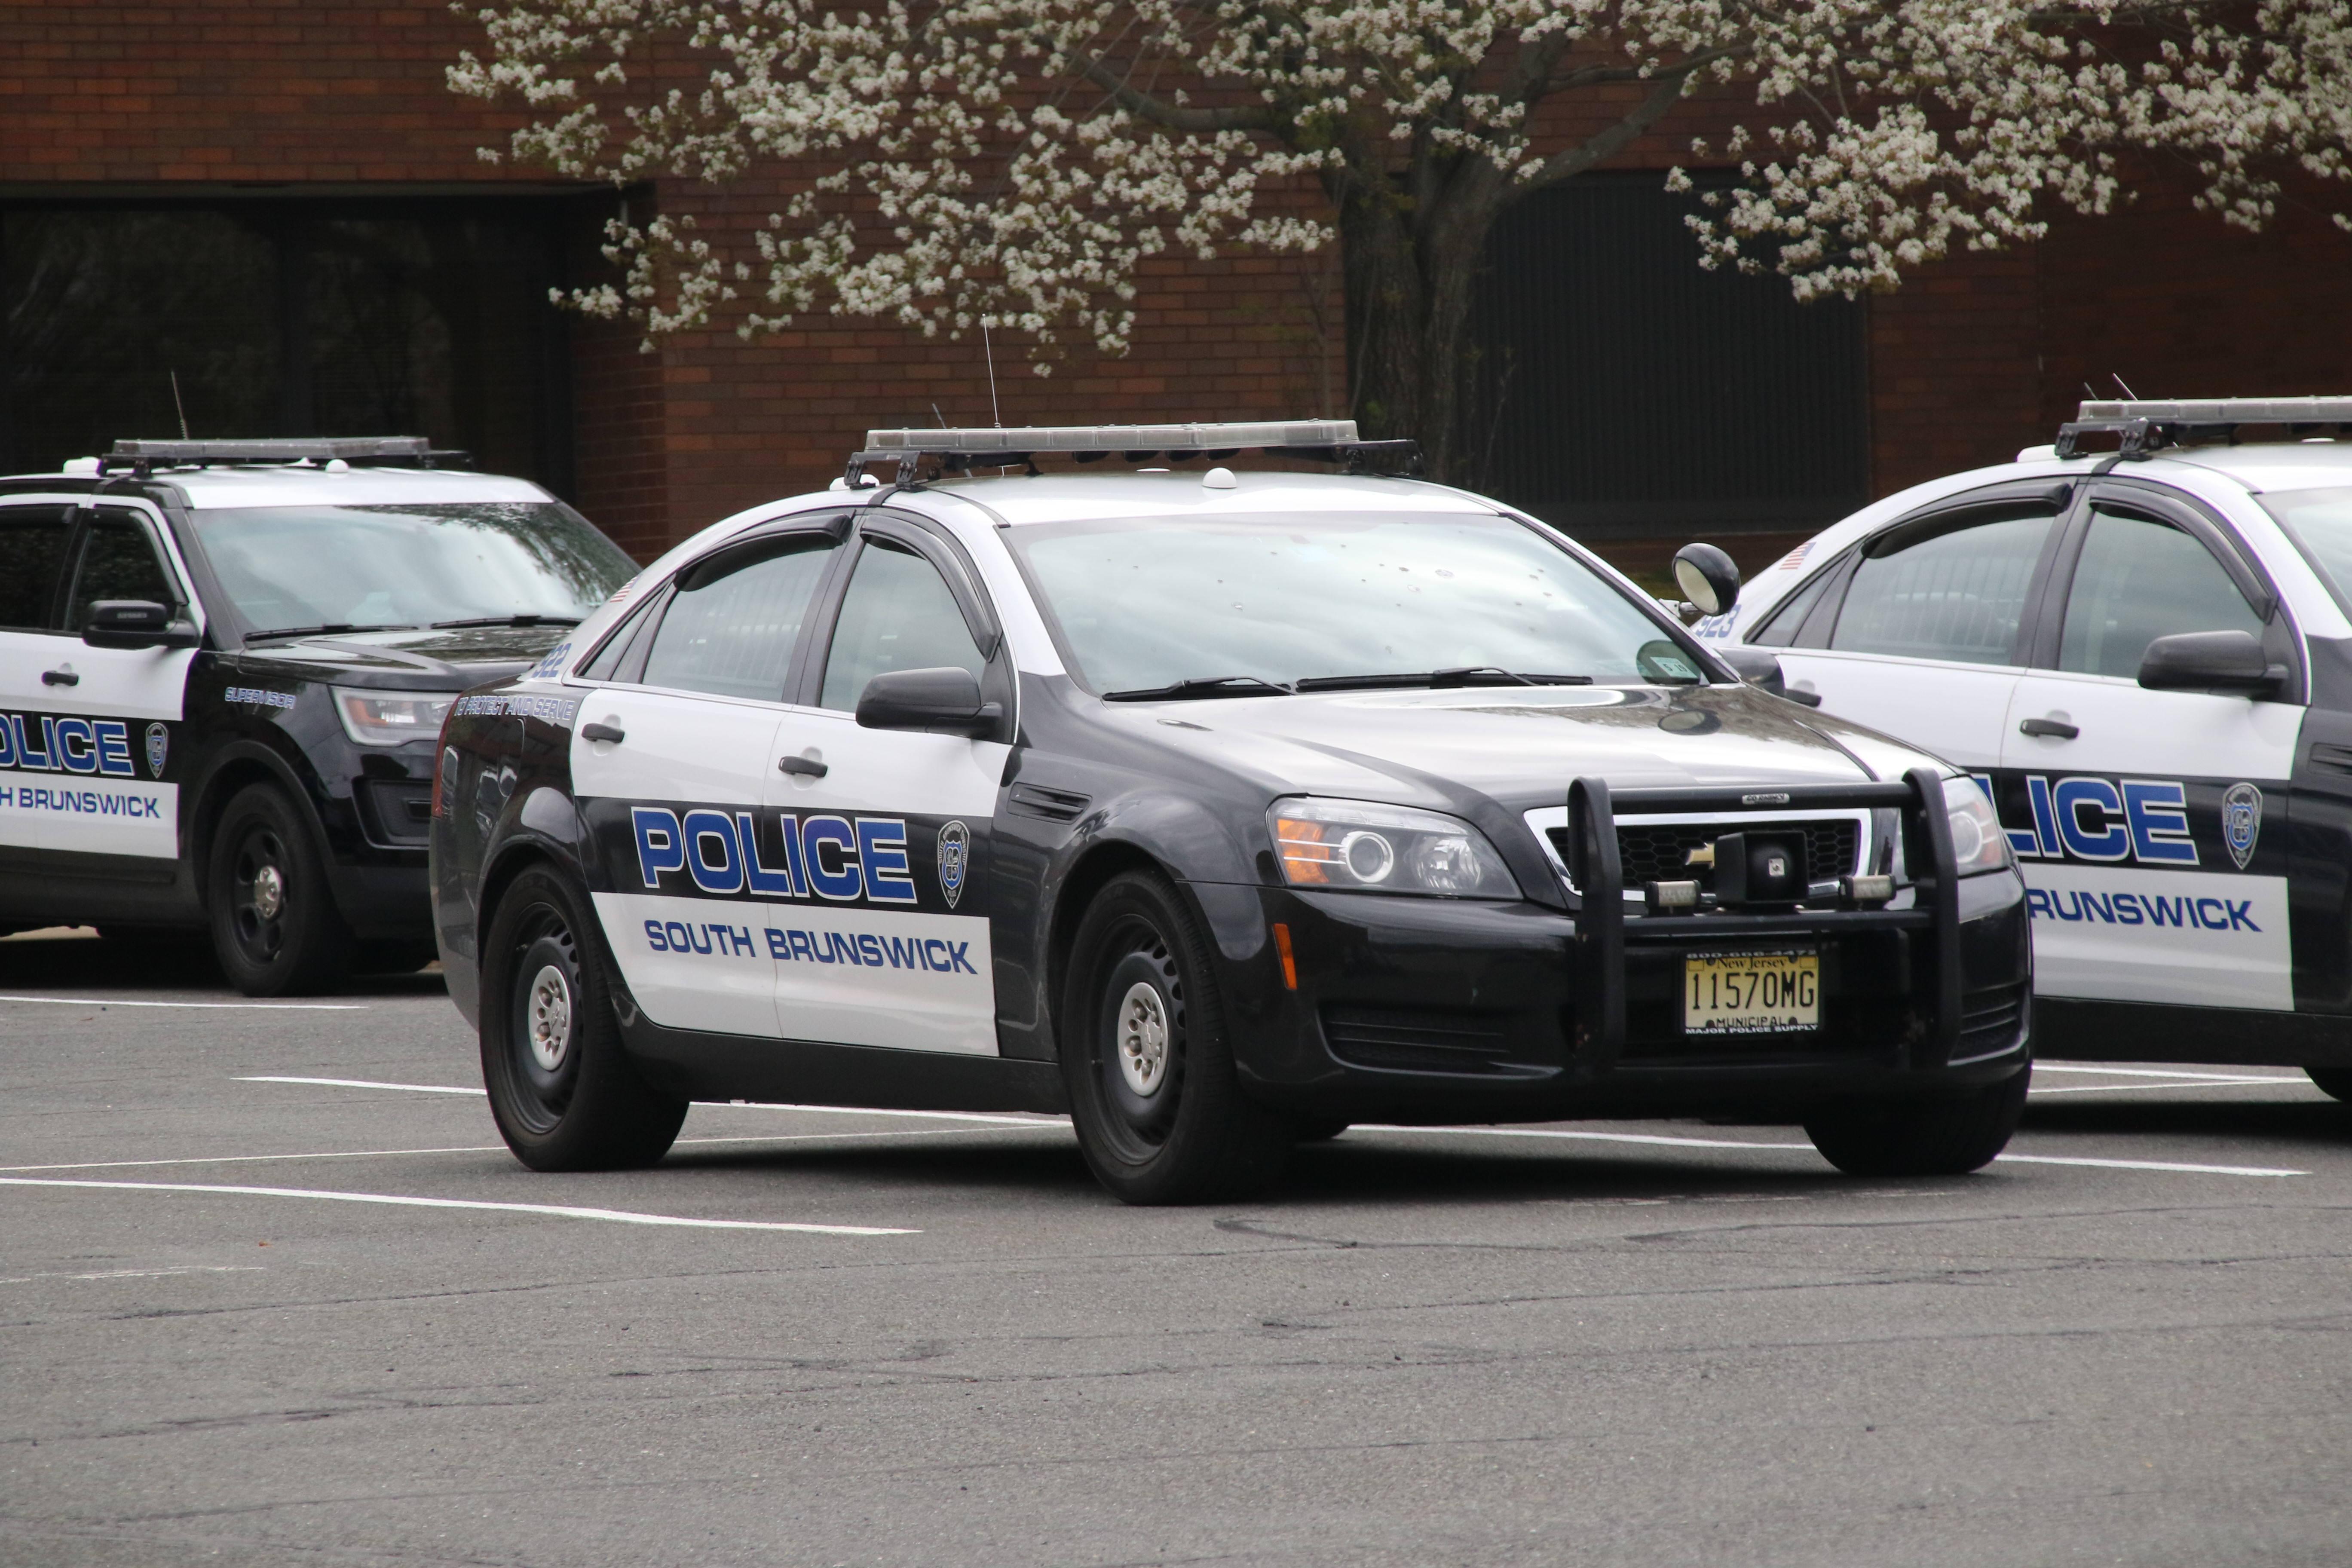 9864e81c966c6afde430_sb_police_car.jpg